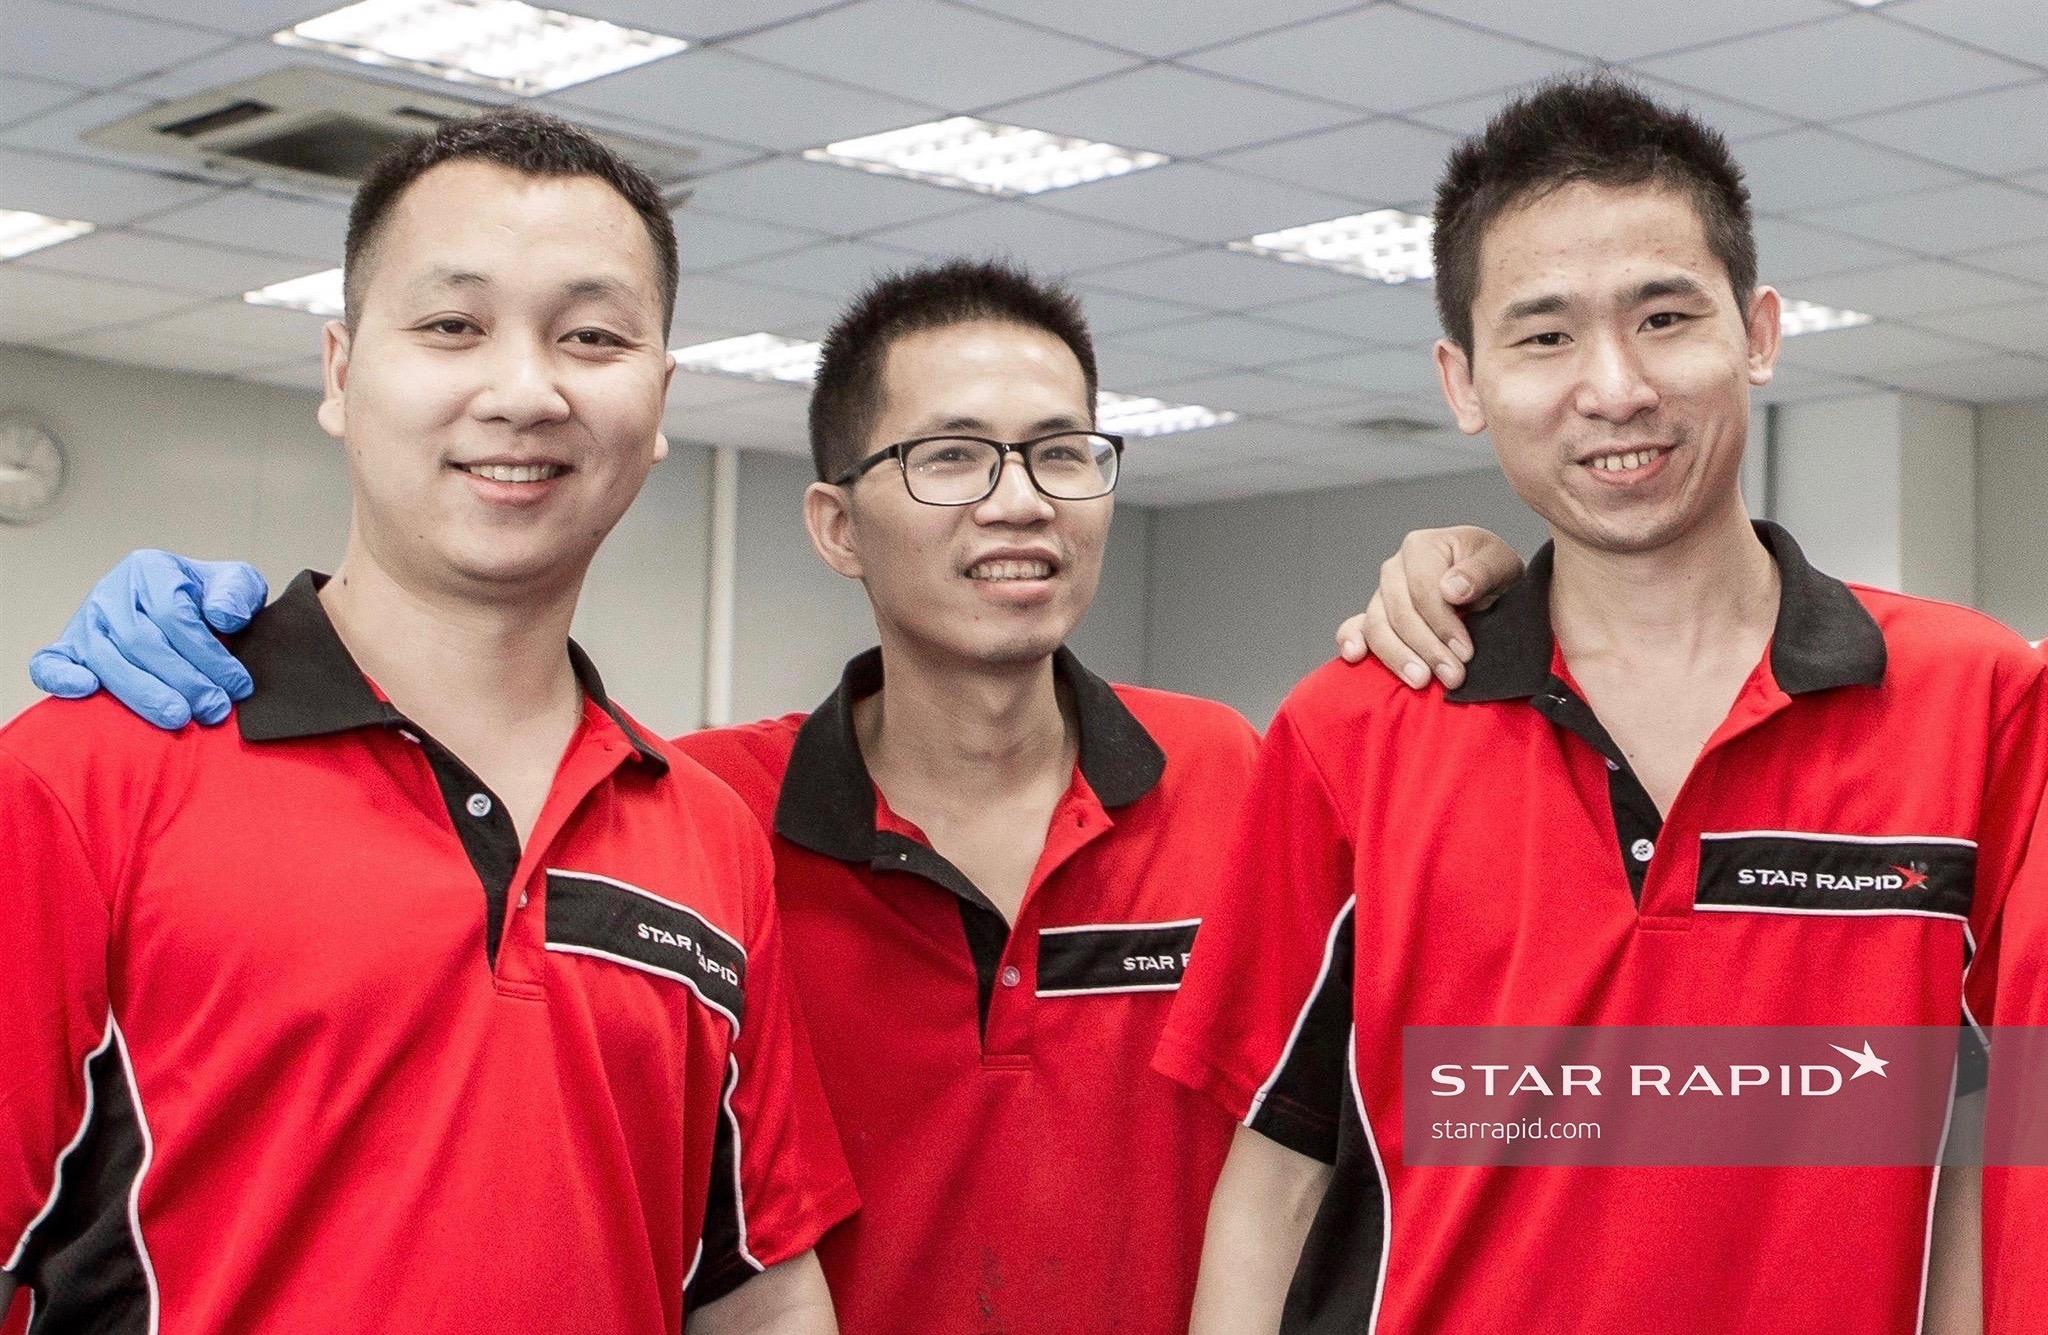 Star Rapid Employees